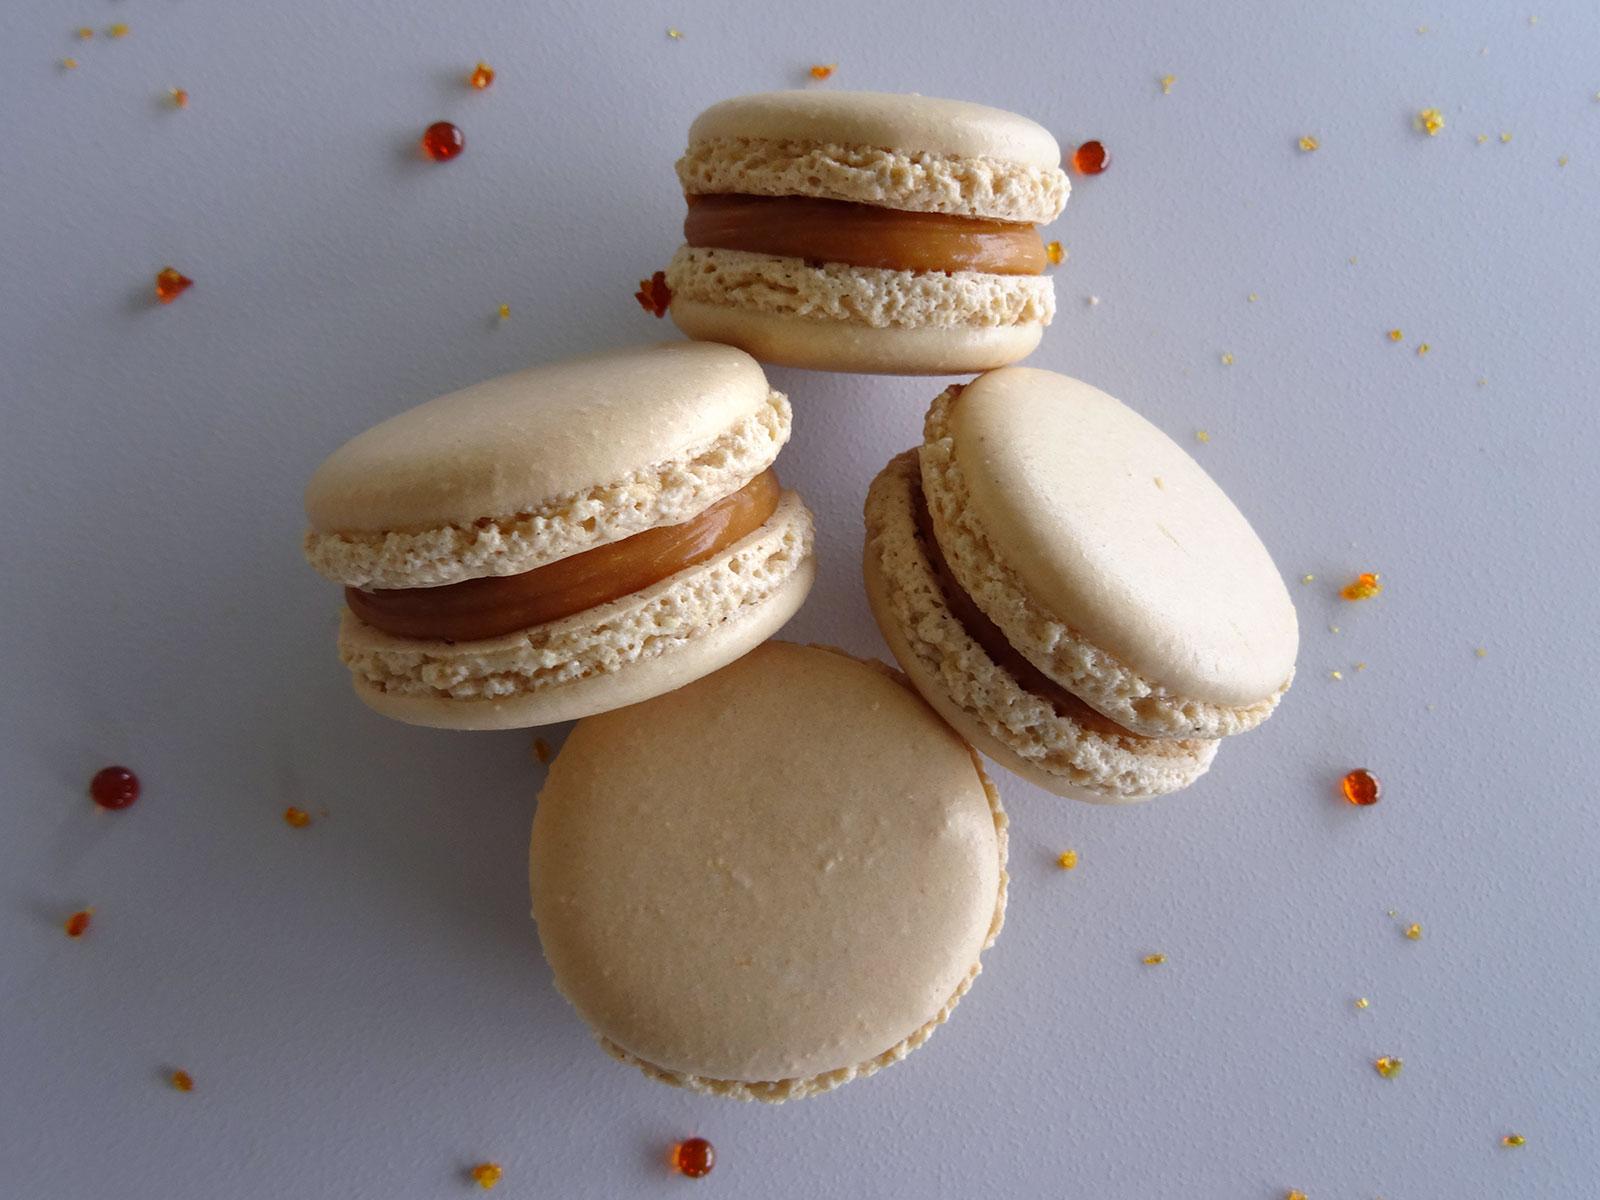 Macarons caramel beurre salé de Christophe Felder